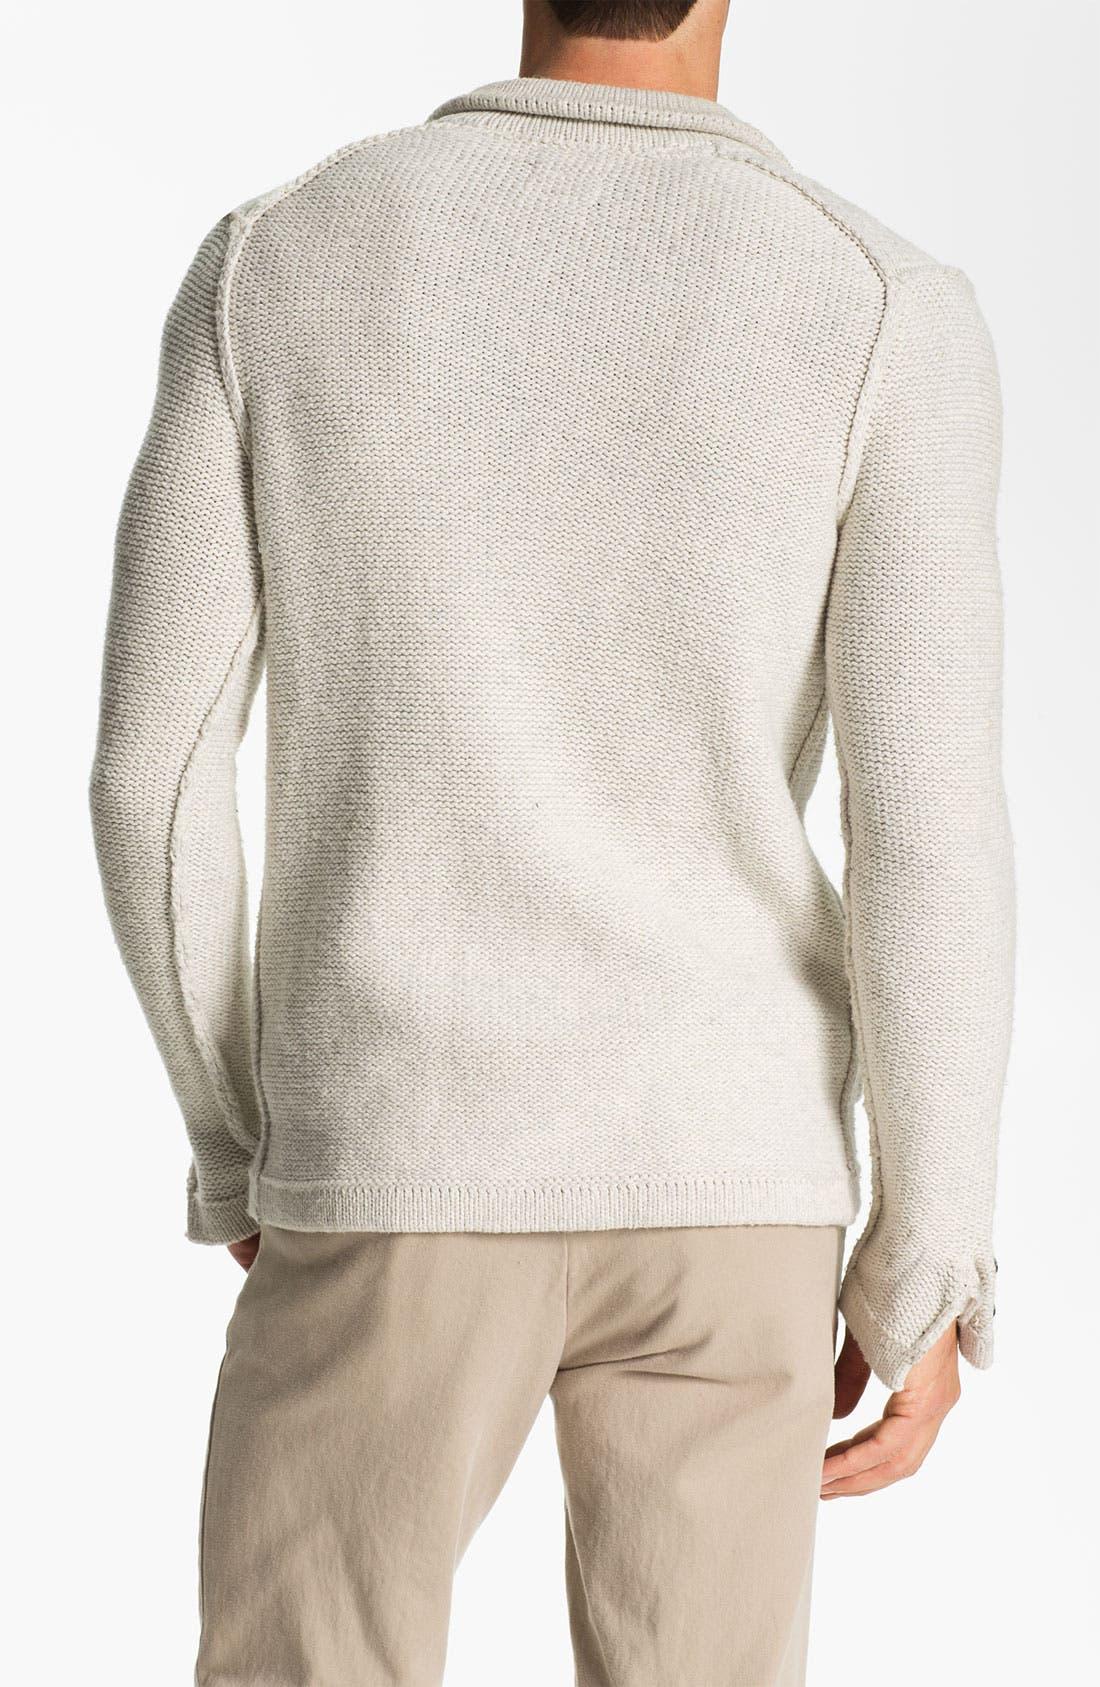 Alternate Image 2  - J.C. Rags Reverse Knit Three Button Sweater Blazer